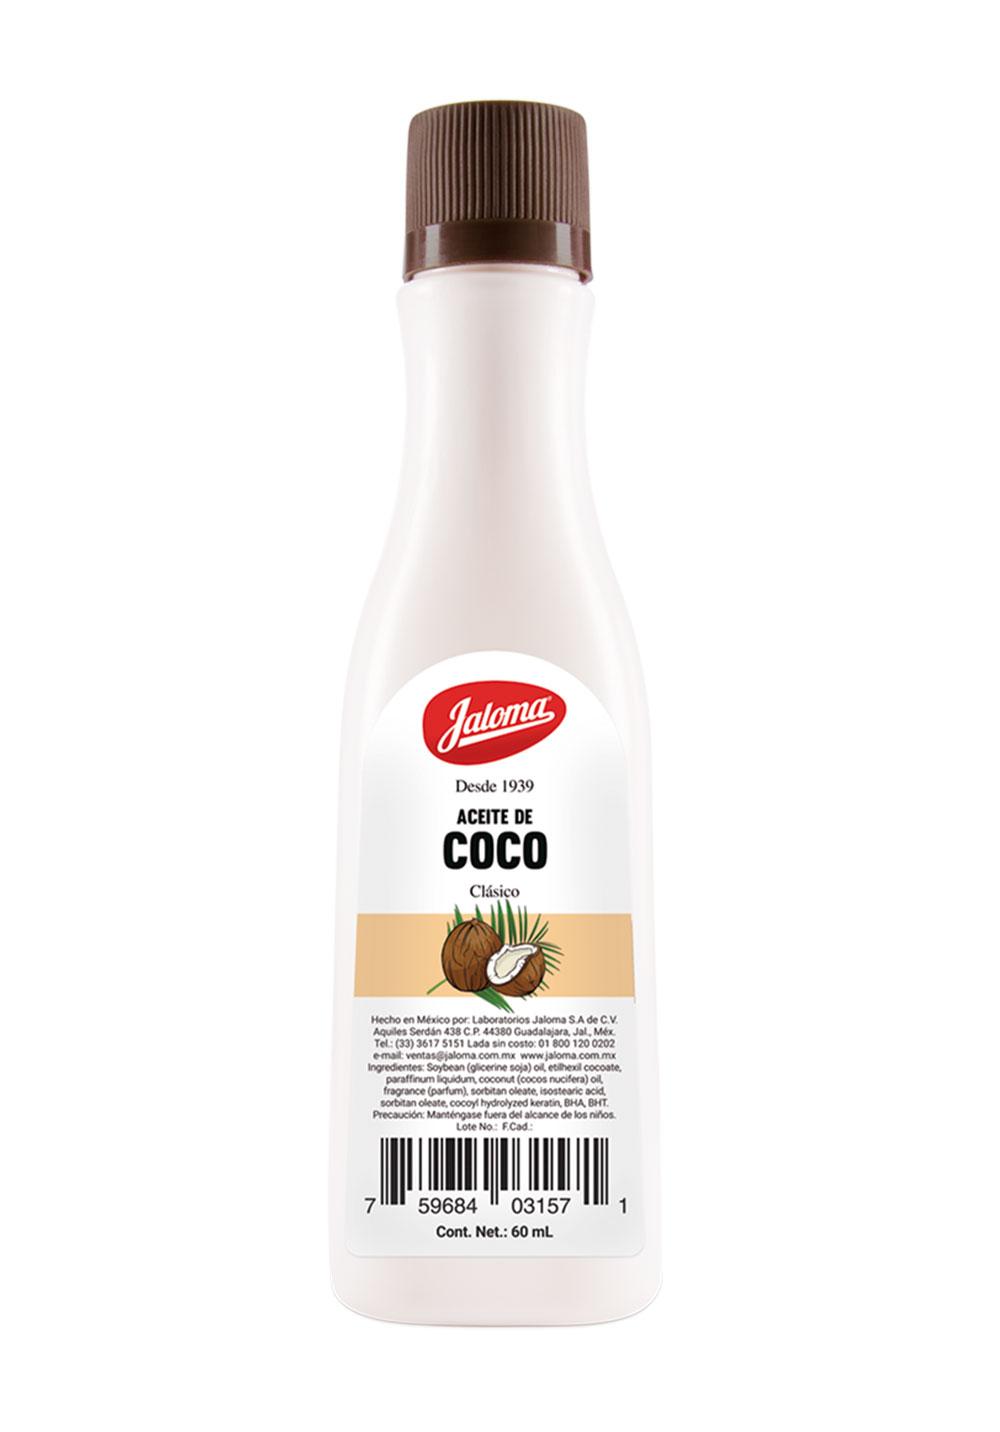 Aceite clásico de Coco, 60 ml.